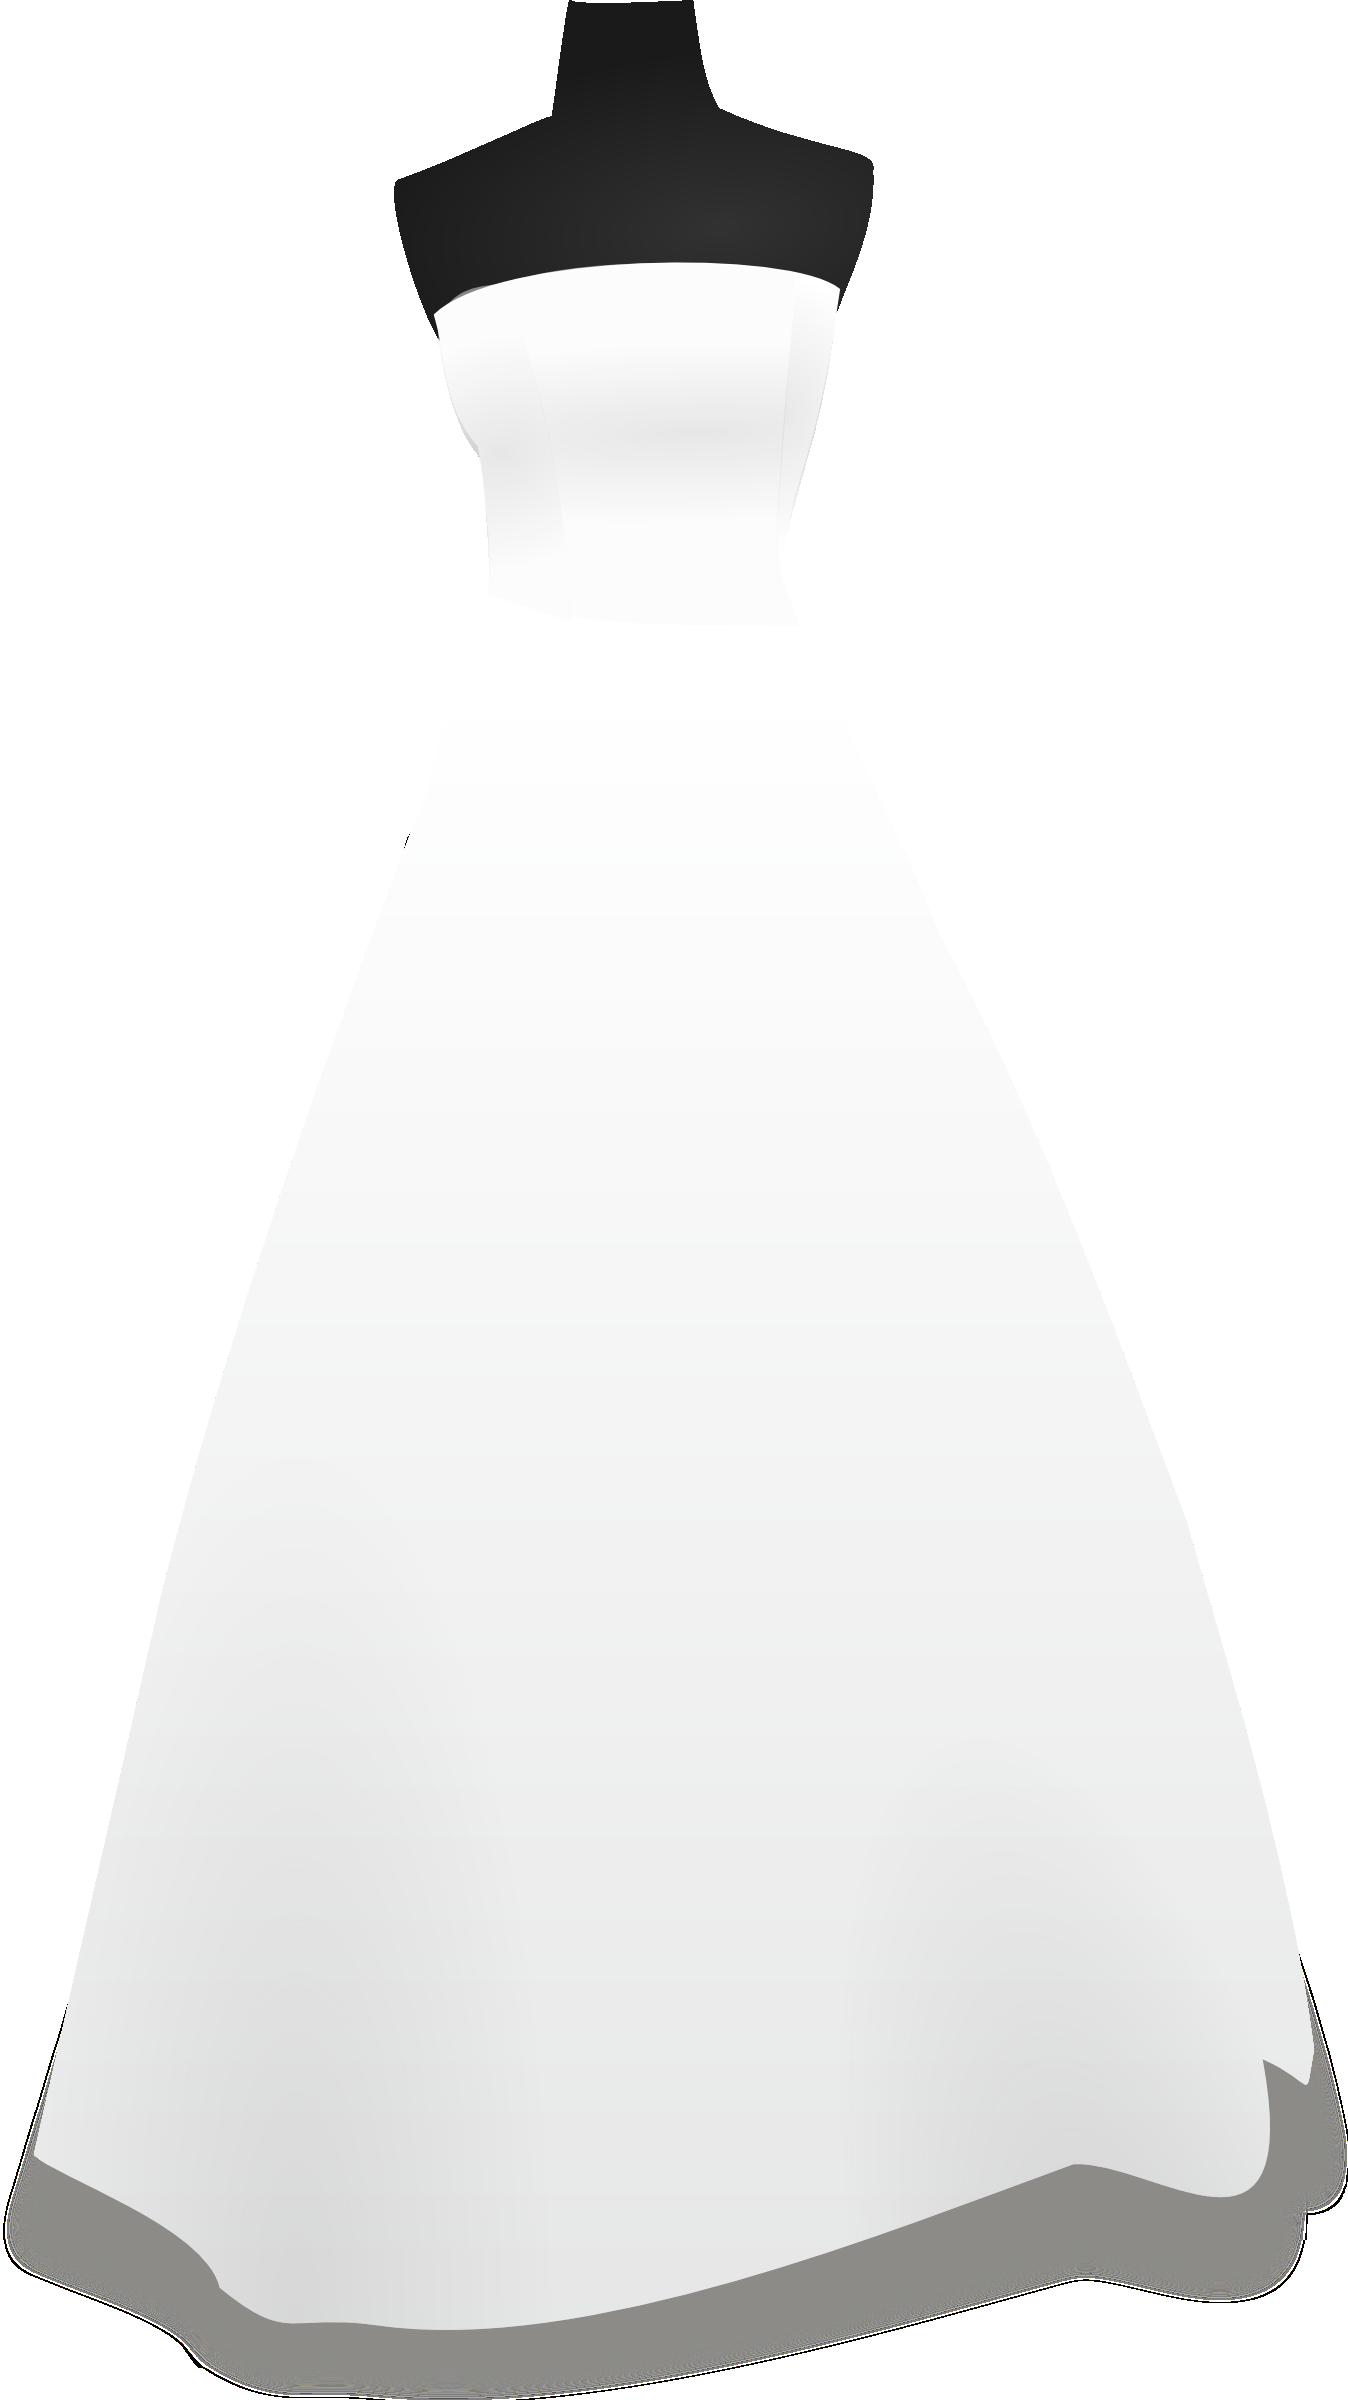 Dress clipart party dress. Wedding png panda free